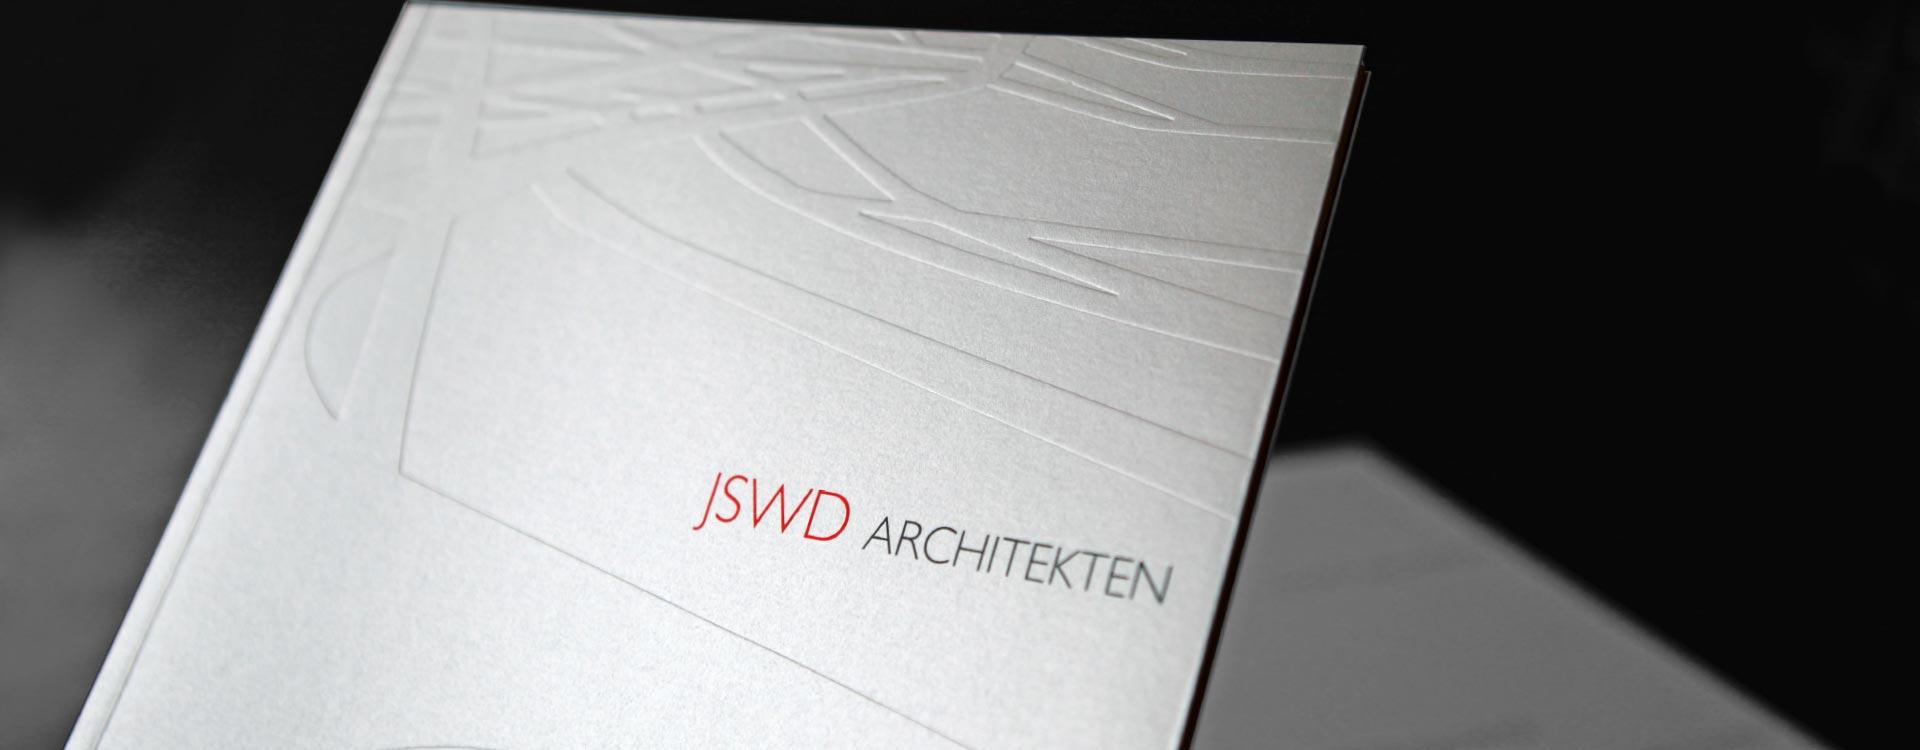 Image brochure for JSWD Architekten, Köln, with embossed envelope; Design: Kattrin Richter | Graphic Design Studio